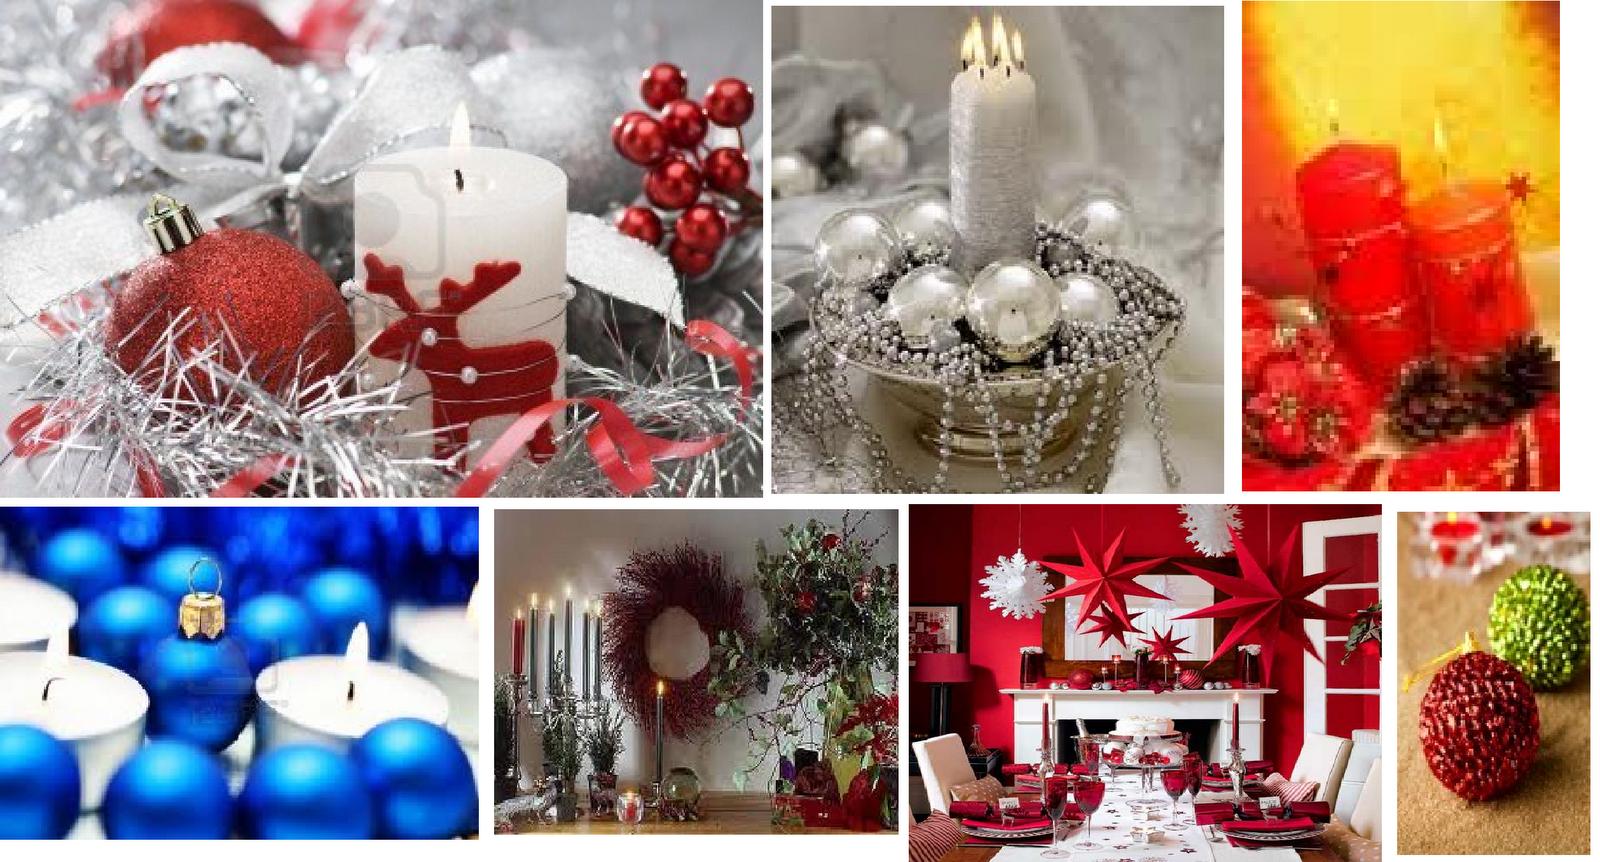 Dise o y decoraci n decoraci n navide a - Decoracion navidena moderna ...